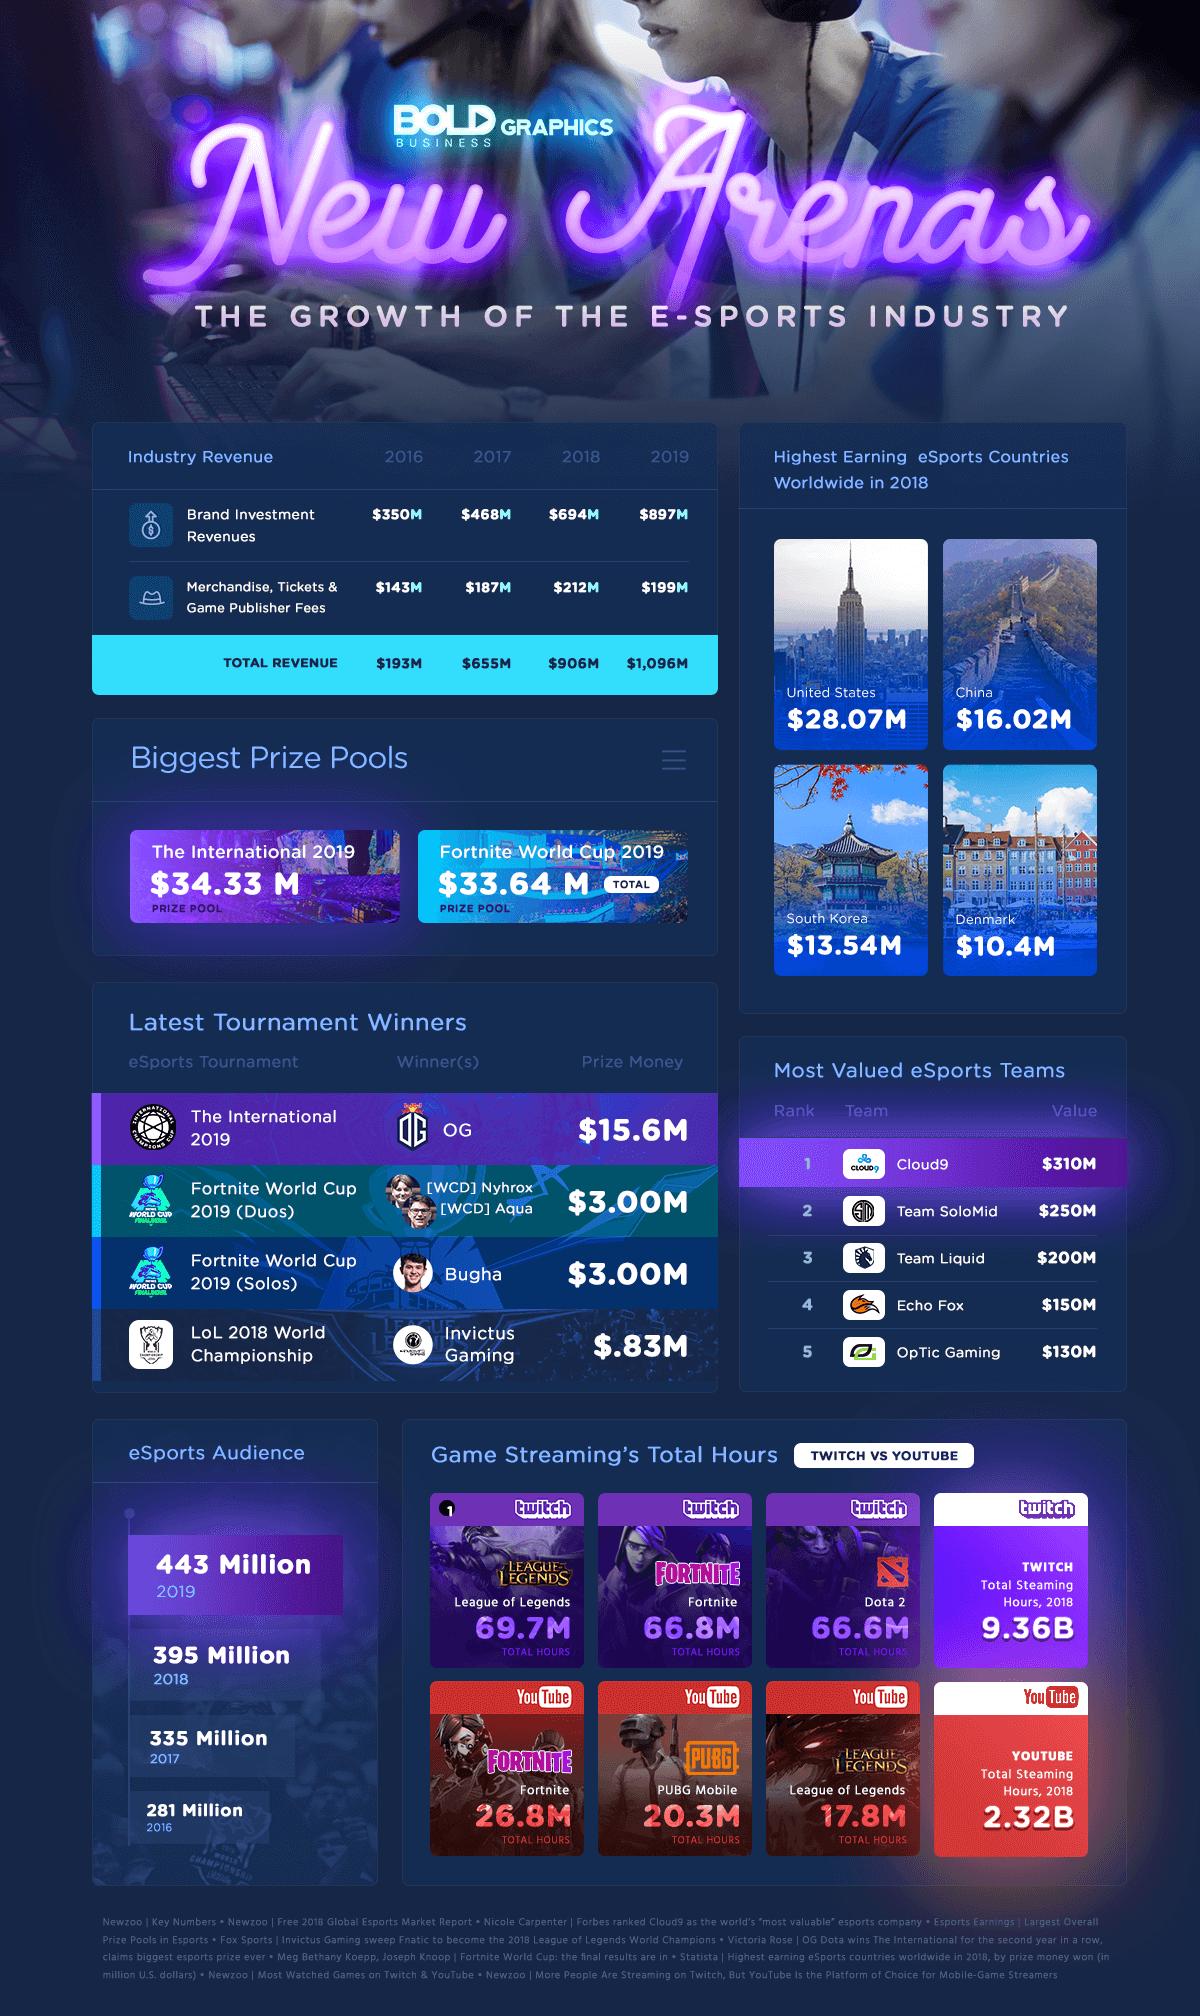 New Arenas Infographic